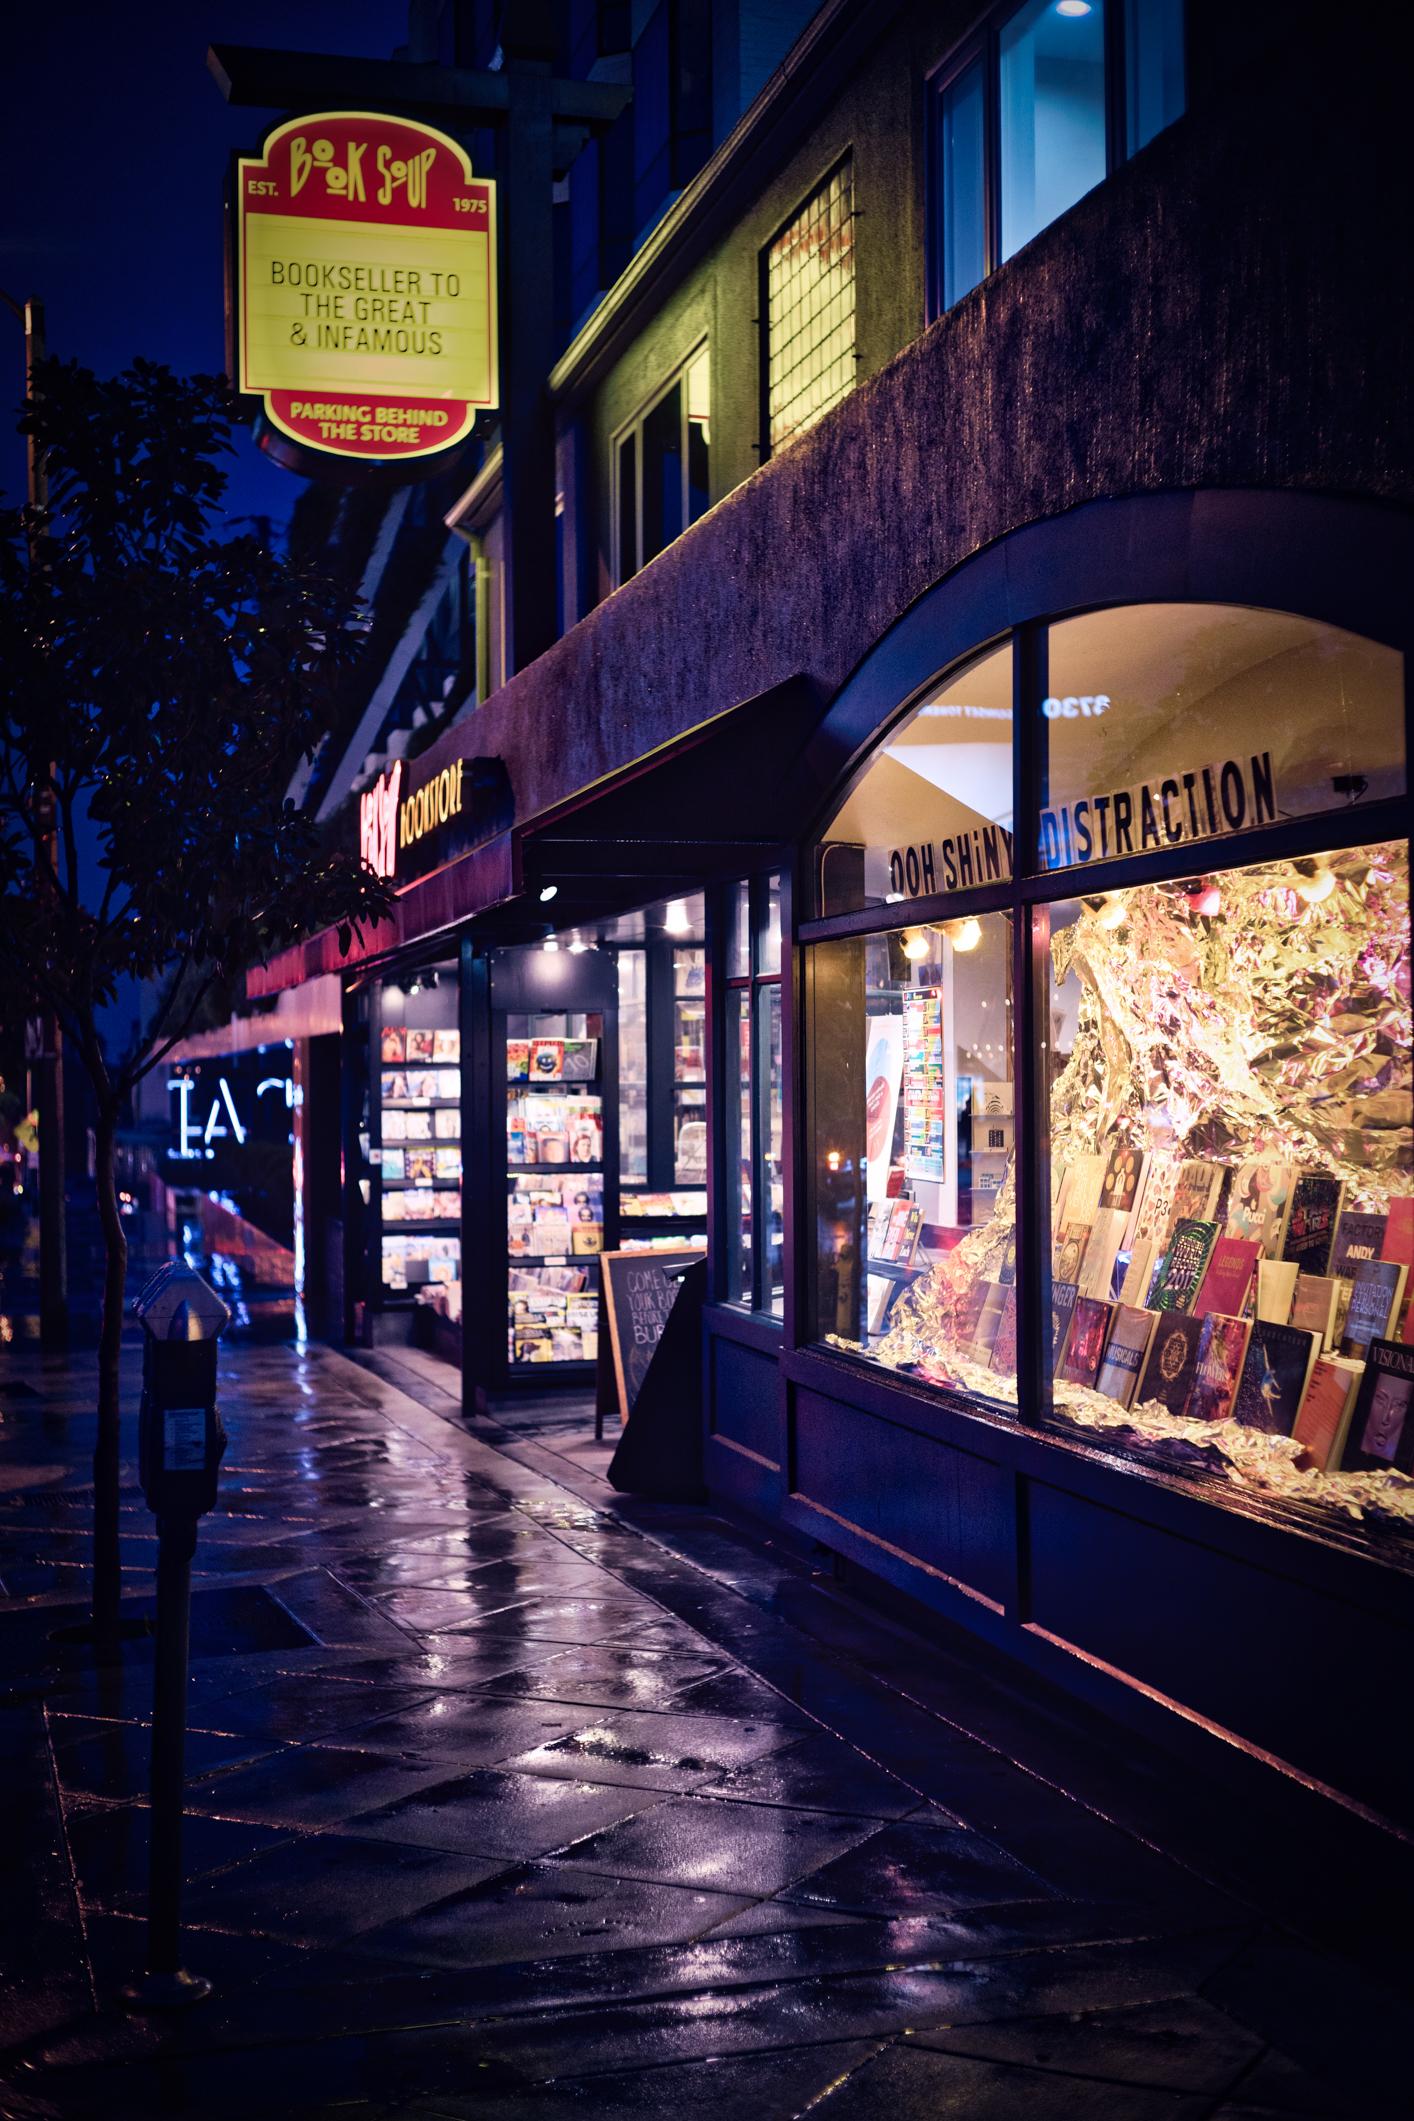 Los-Angeles-Book-Soup-twilight-vertical.jpg